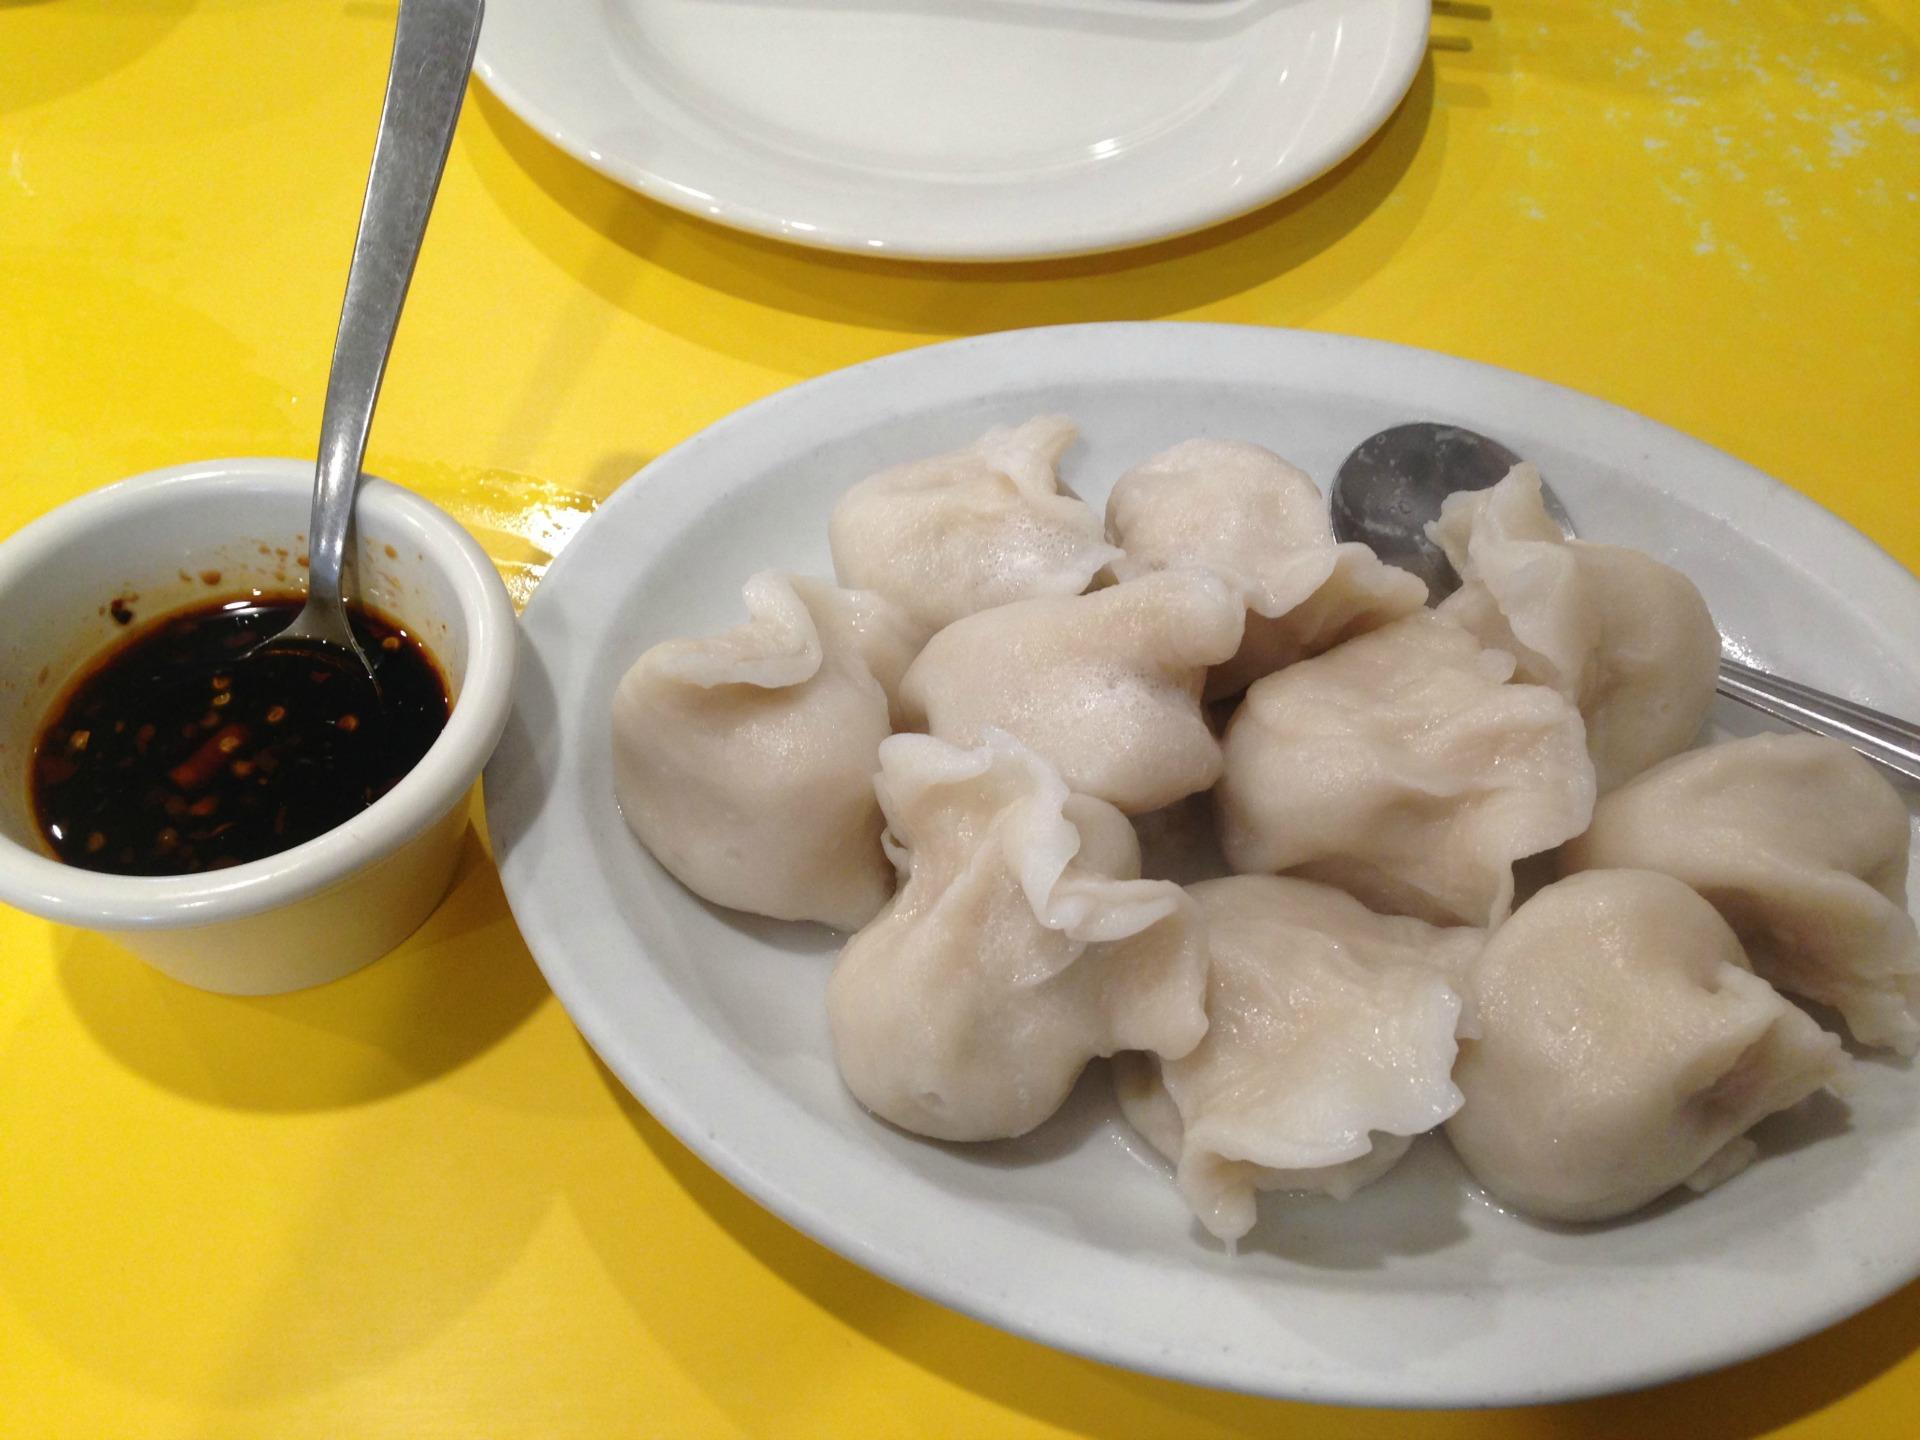 Shan Dong's homemade dumplings.